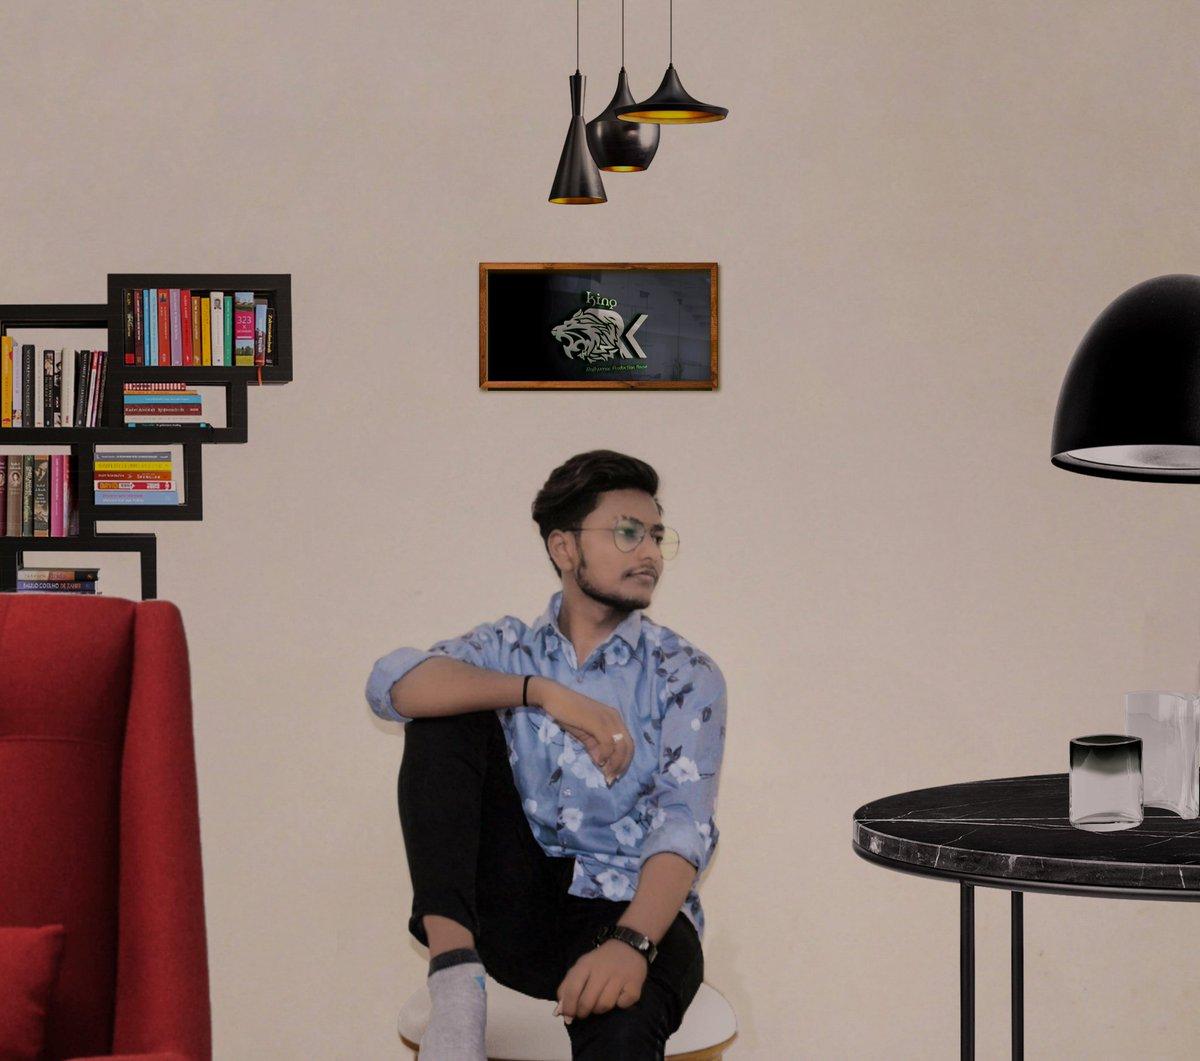 Modelling Photography   #rk_production_house_84 #patelrajkumar8460  #model #modelingphotography #editingpic.twitter.com/J1bS7X62Nw